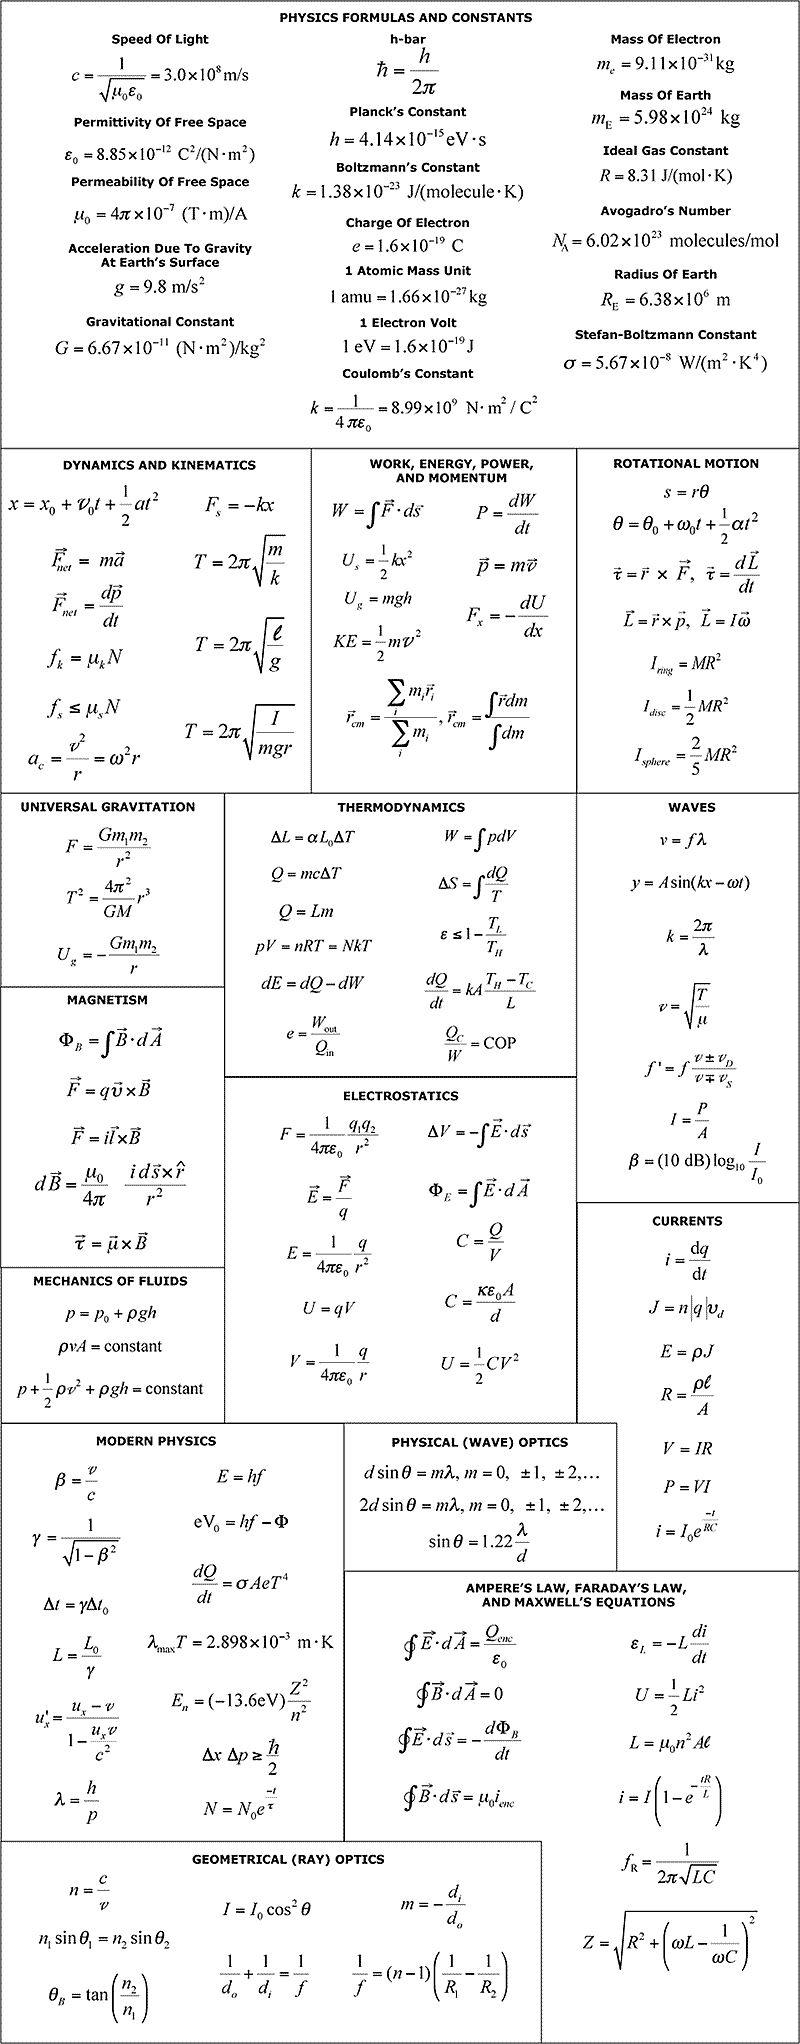 General Physics Formula Set Pinterest Introduction To 7400 Series Digital Logic Devices Fizix Sheet Helpful For Students Of Statistical Mechanicals Electrostatics Quantum Mechanics And Motion Chemistry